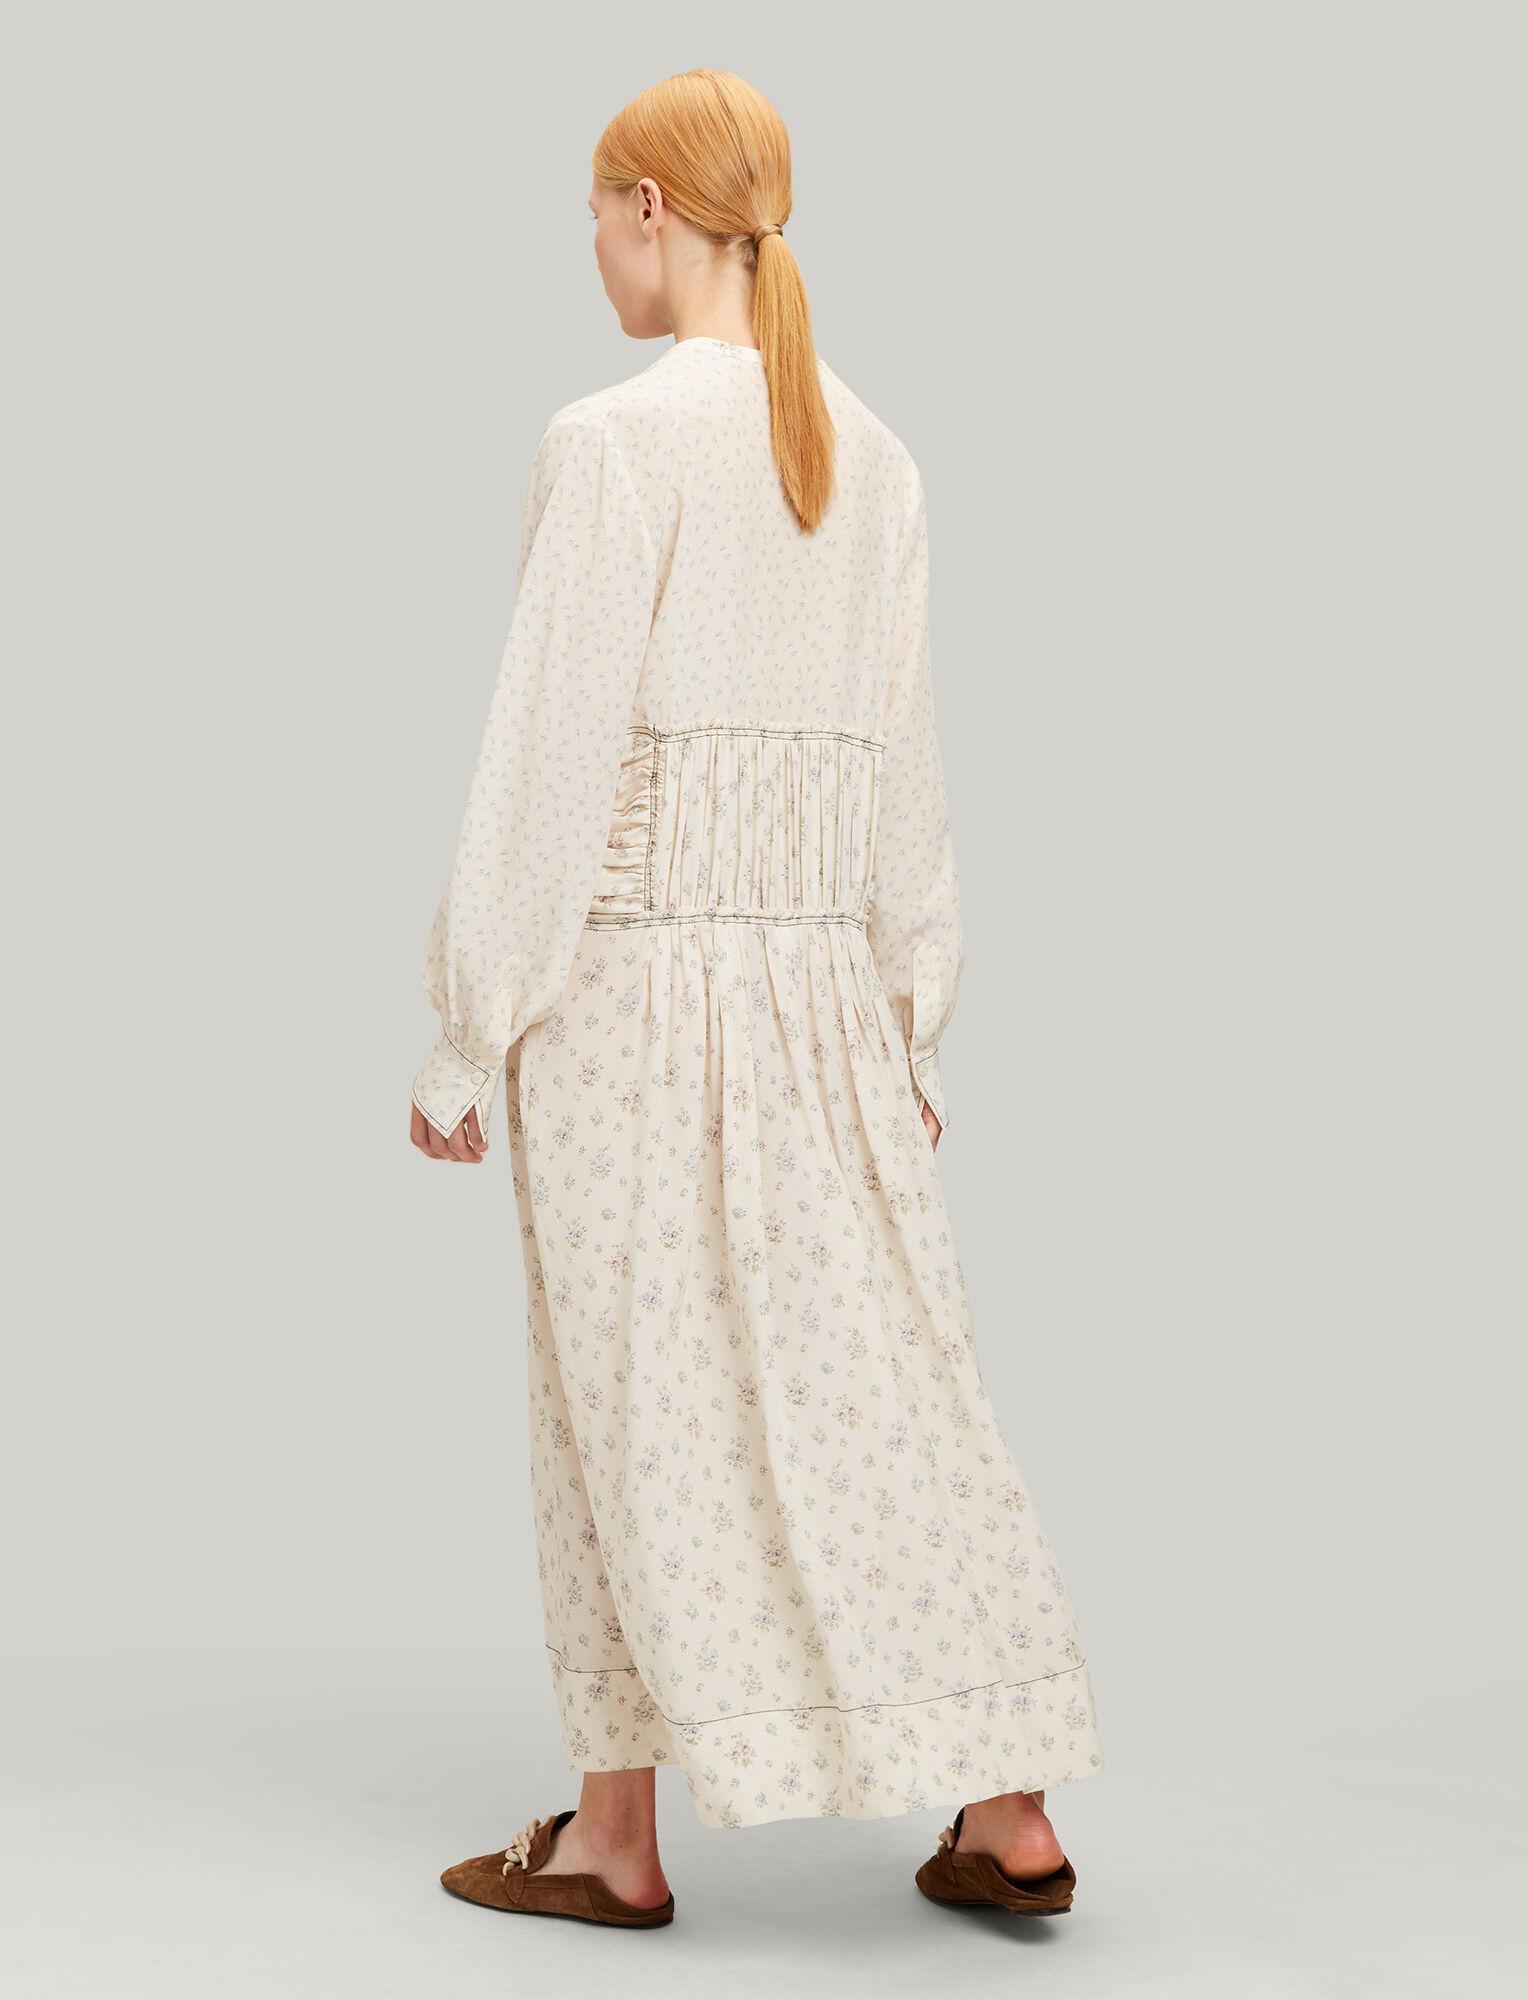 MulticolourJoseph Tala Dress In Patchwork Woolf sthQCrd